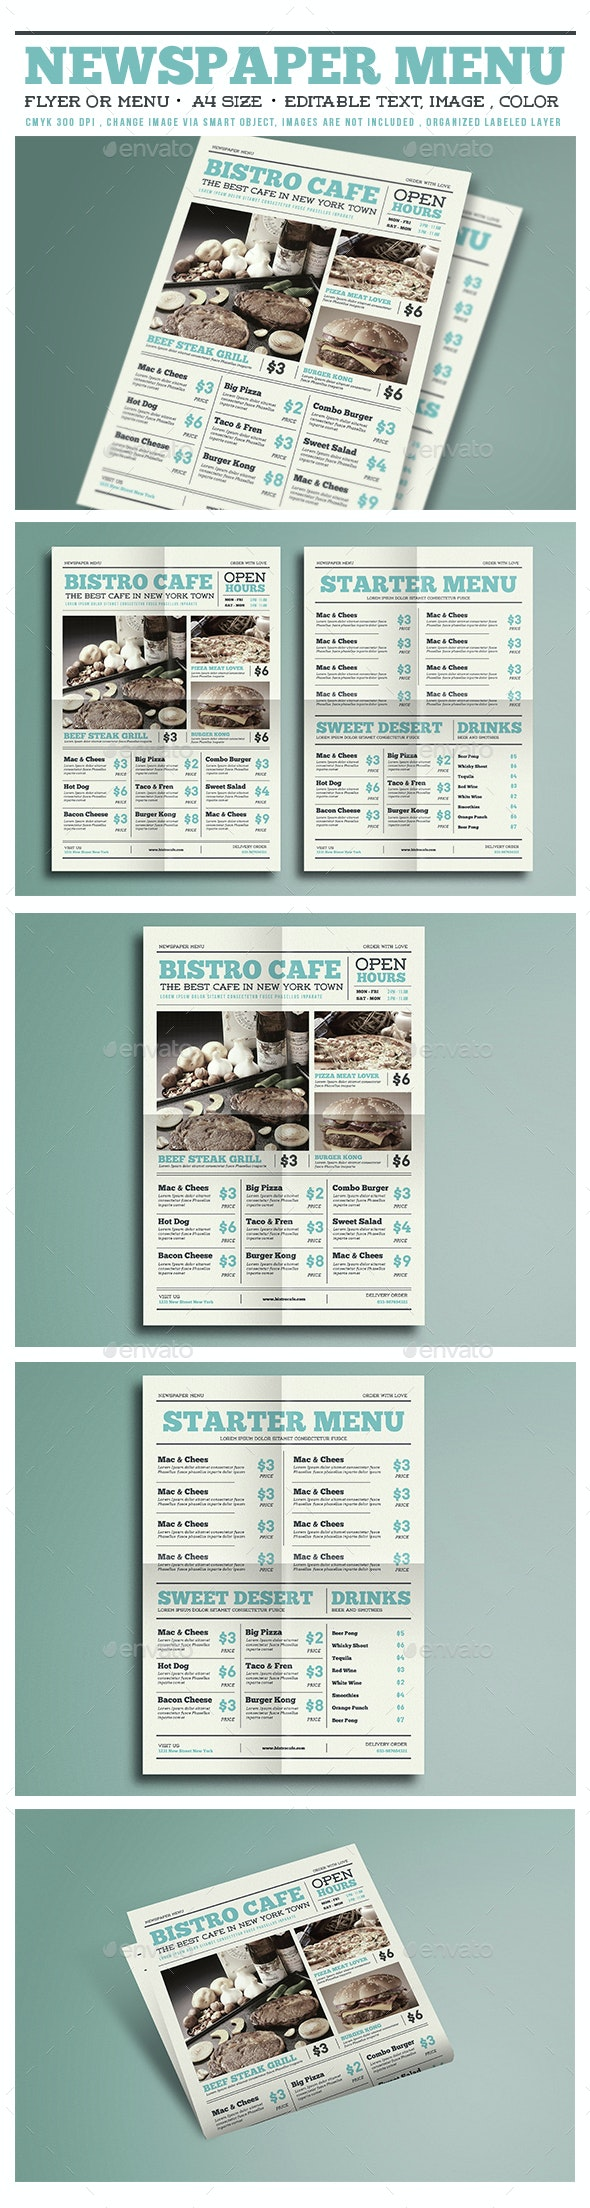 Newspaper Menu Flyer  - Restaurant Flyers